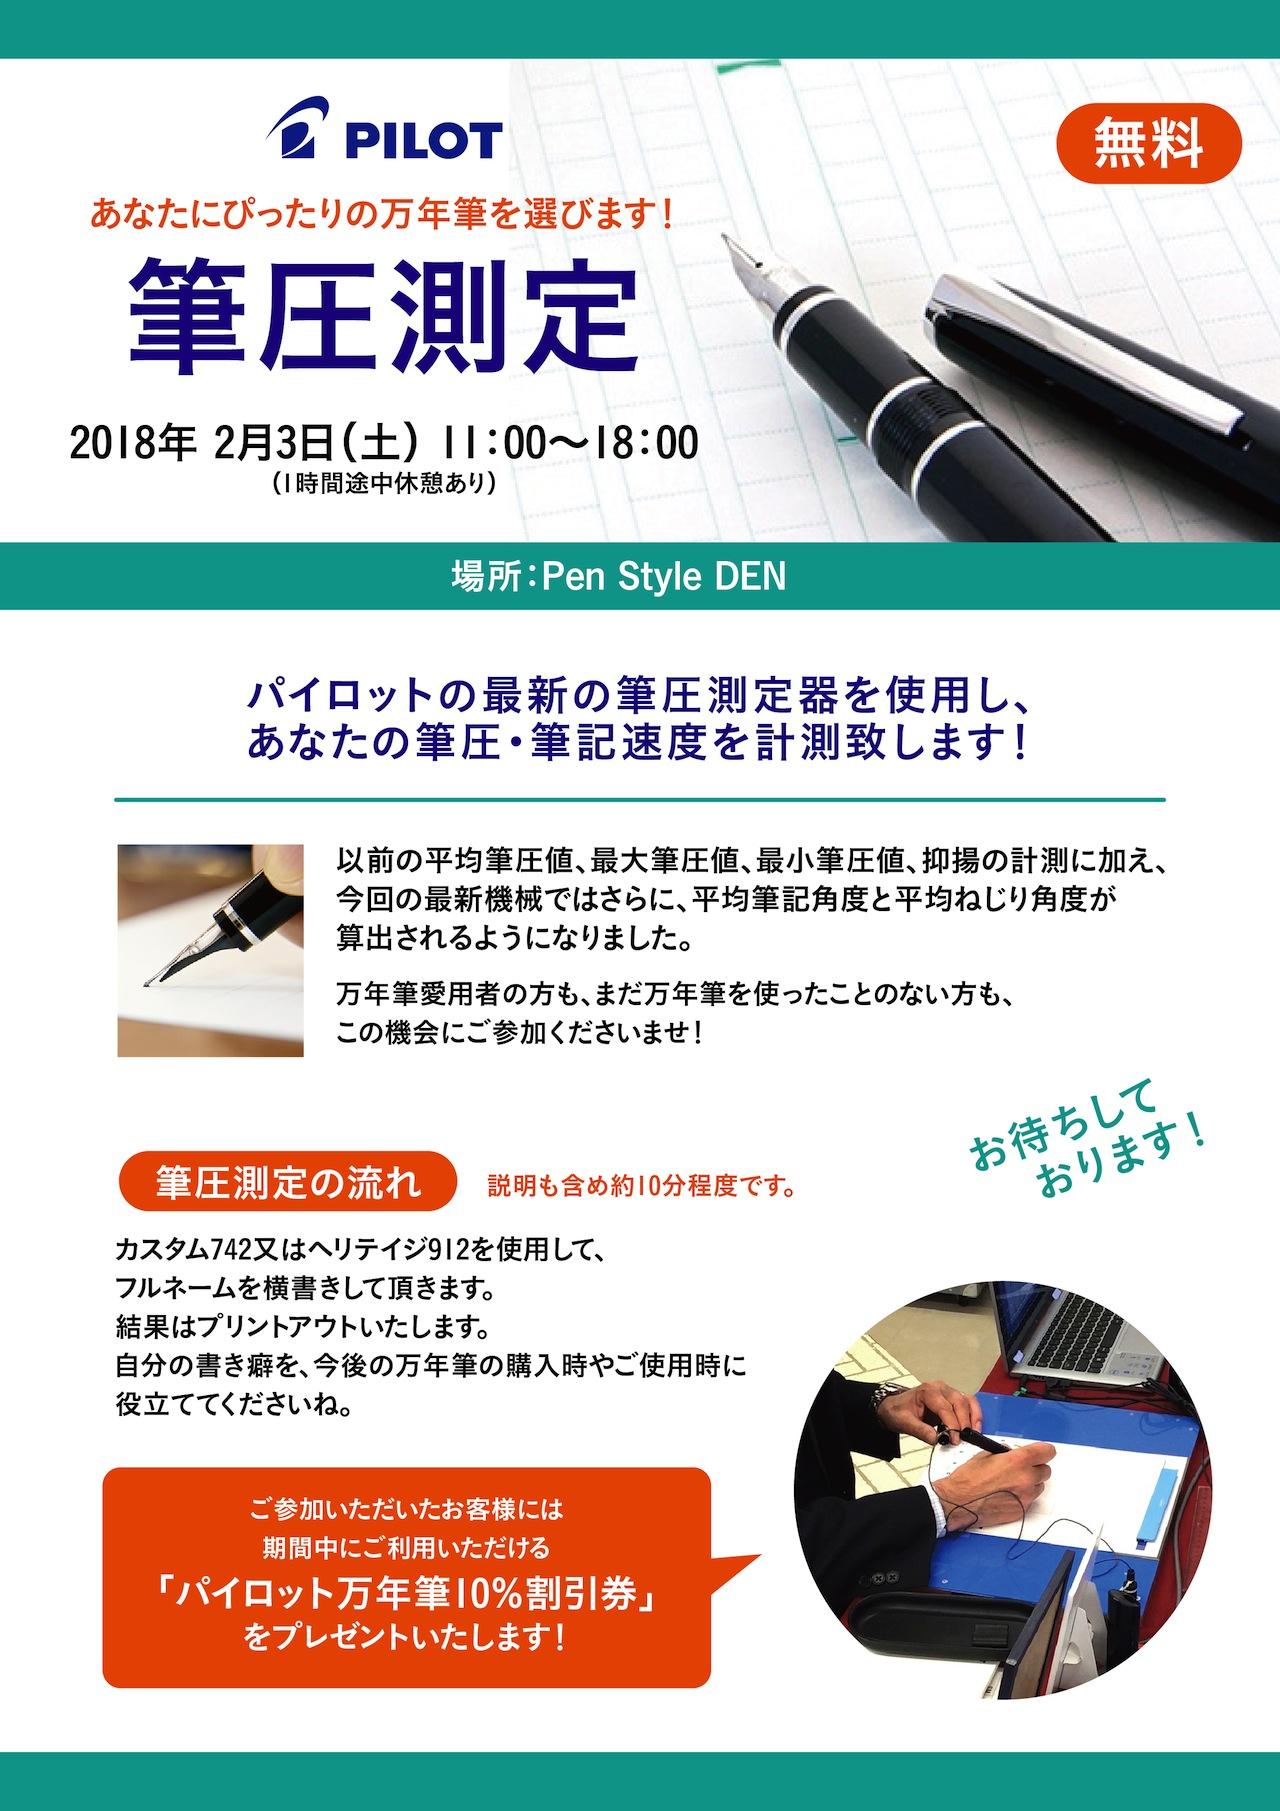 PILOT 筆圧測定であなたにぴったりの万年筆を!|NAGASAWA PenStyle DEN